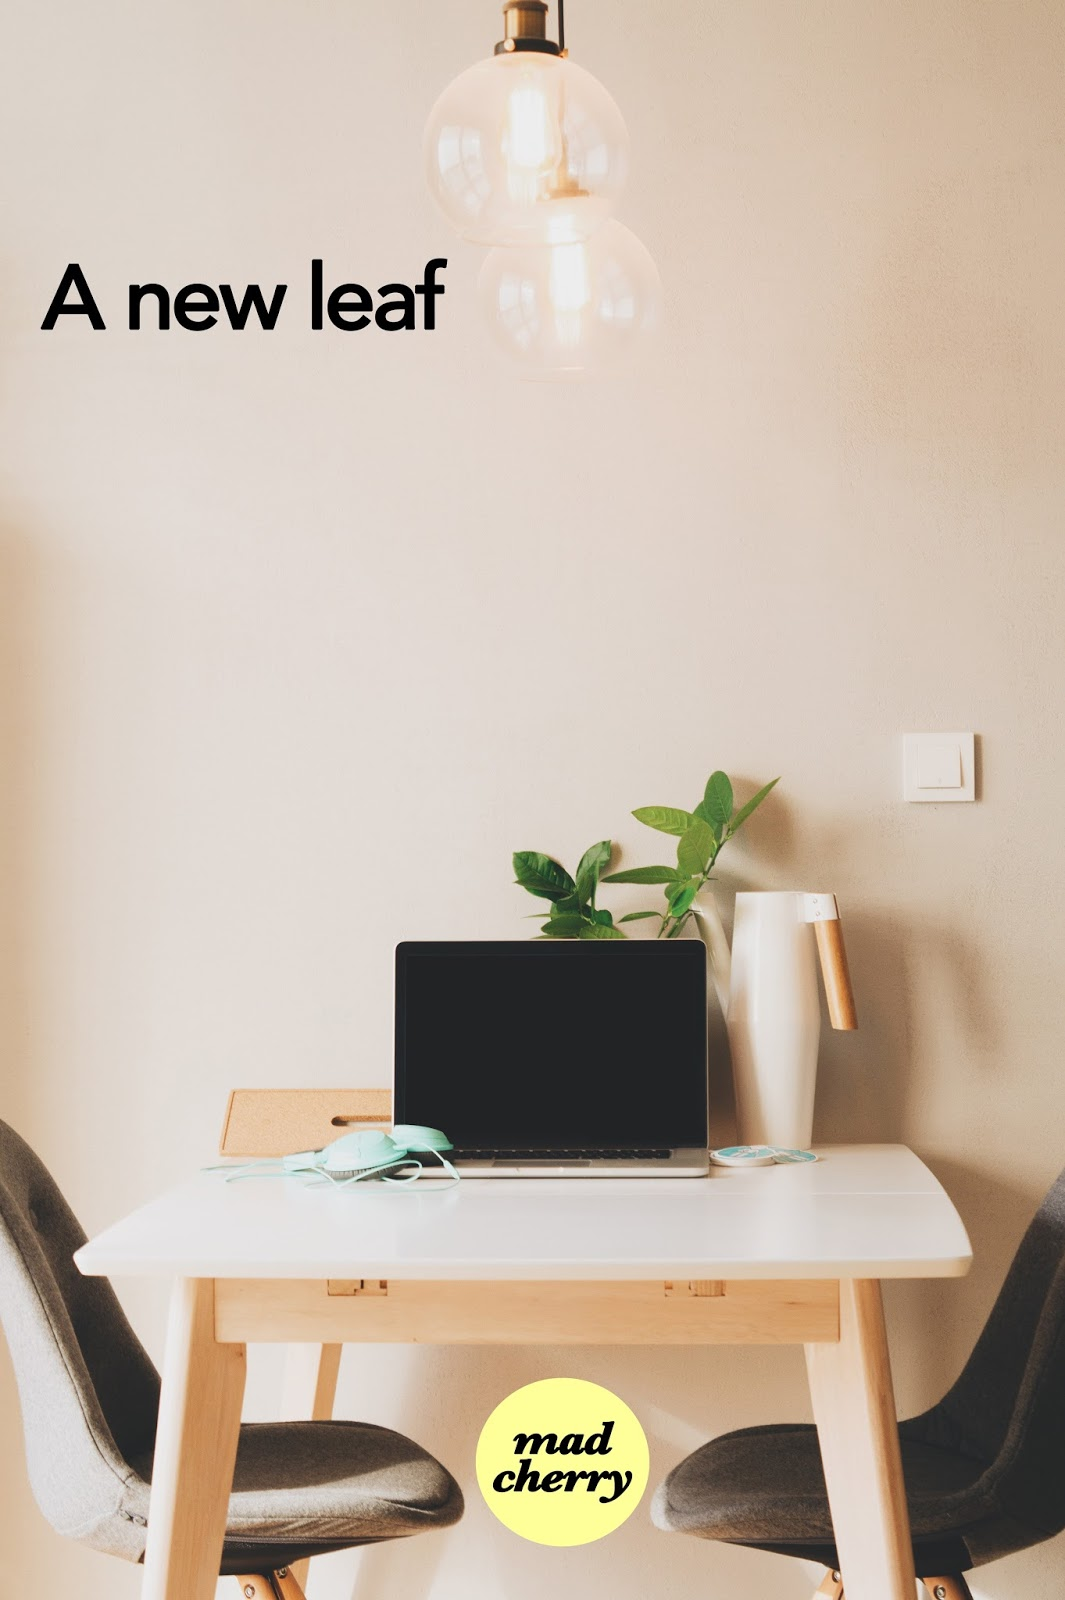 a new leaf mad cherry min